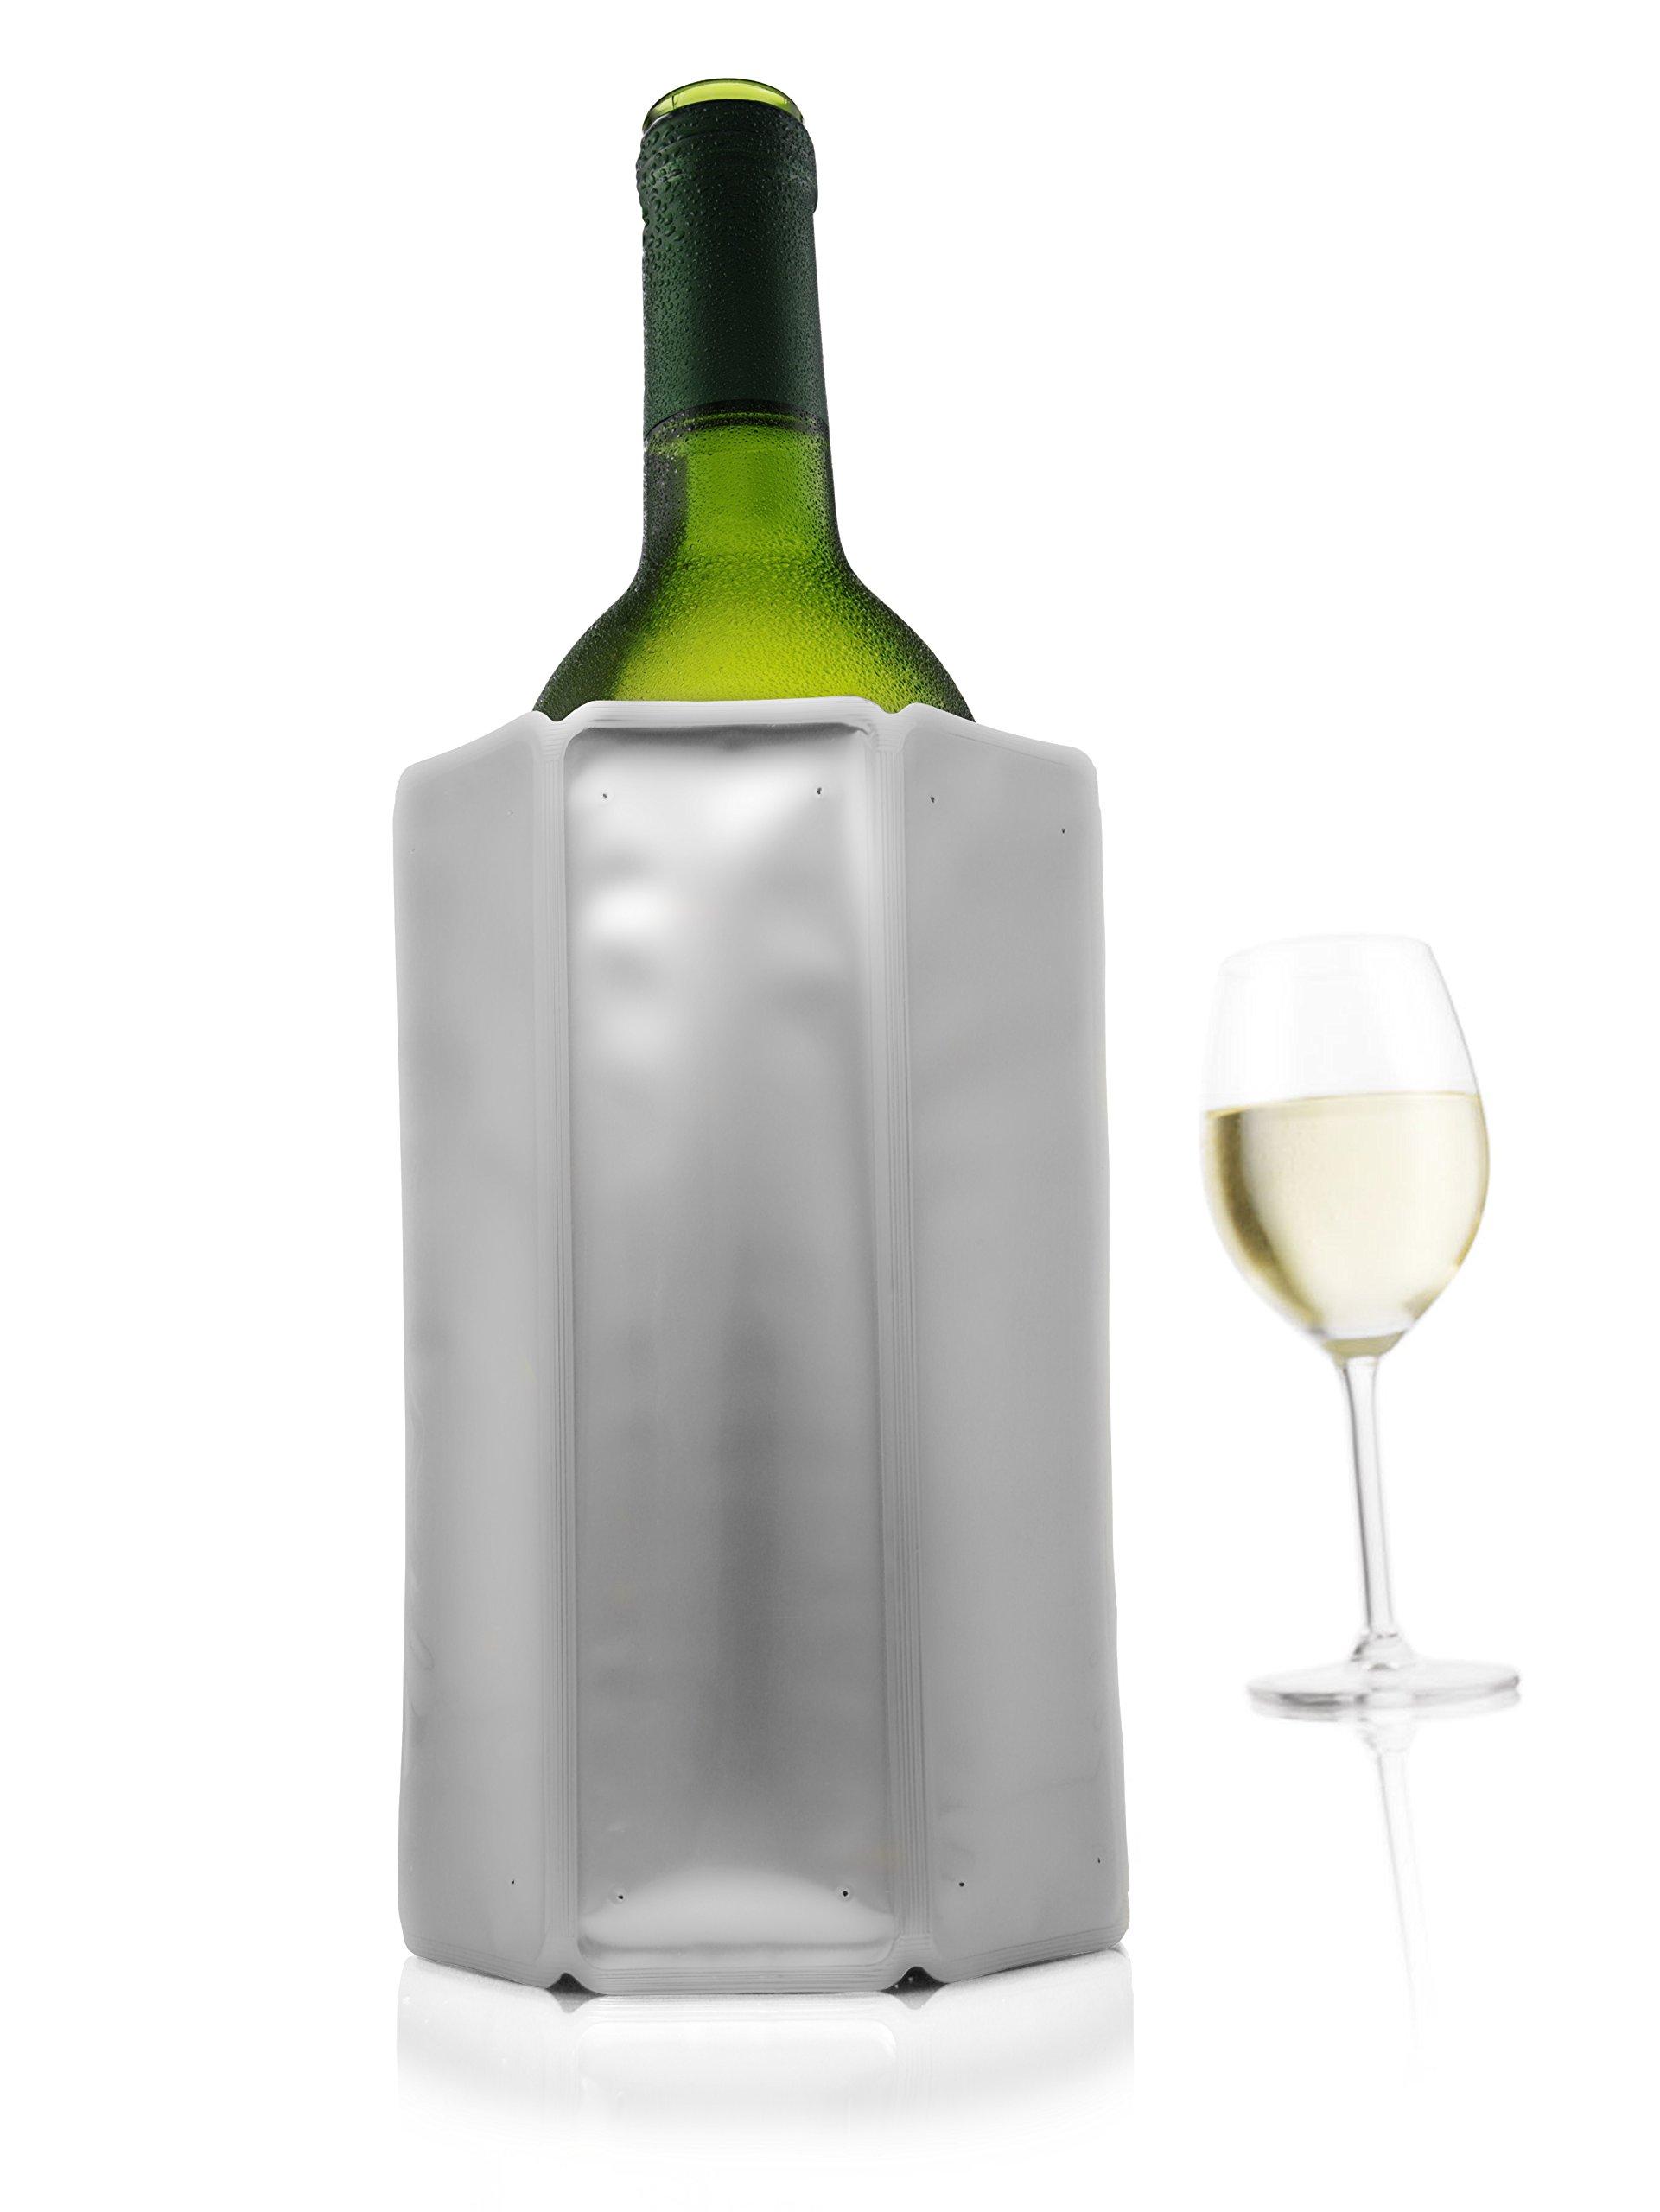 Vacu Vin Rapid Ice Wine Cooler - Chrome by Vacu Vin (Image #1)